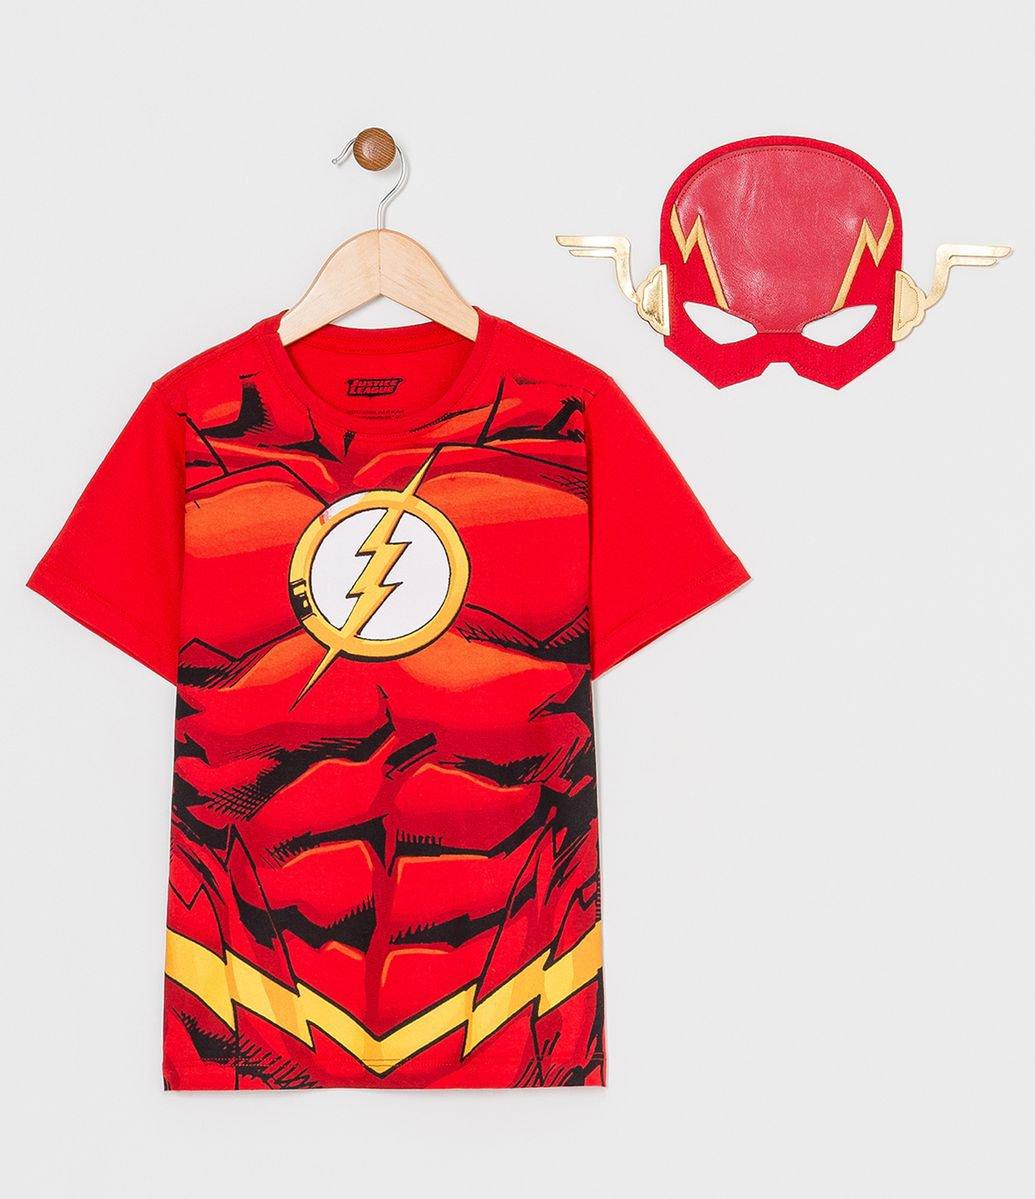 399109751194d5 Camiseta Infantil Estampa Realista The Flash com Máscara - Tam 2 a 8 anos